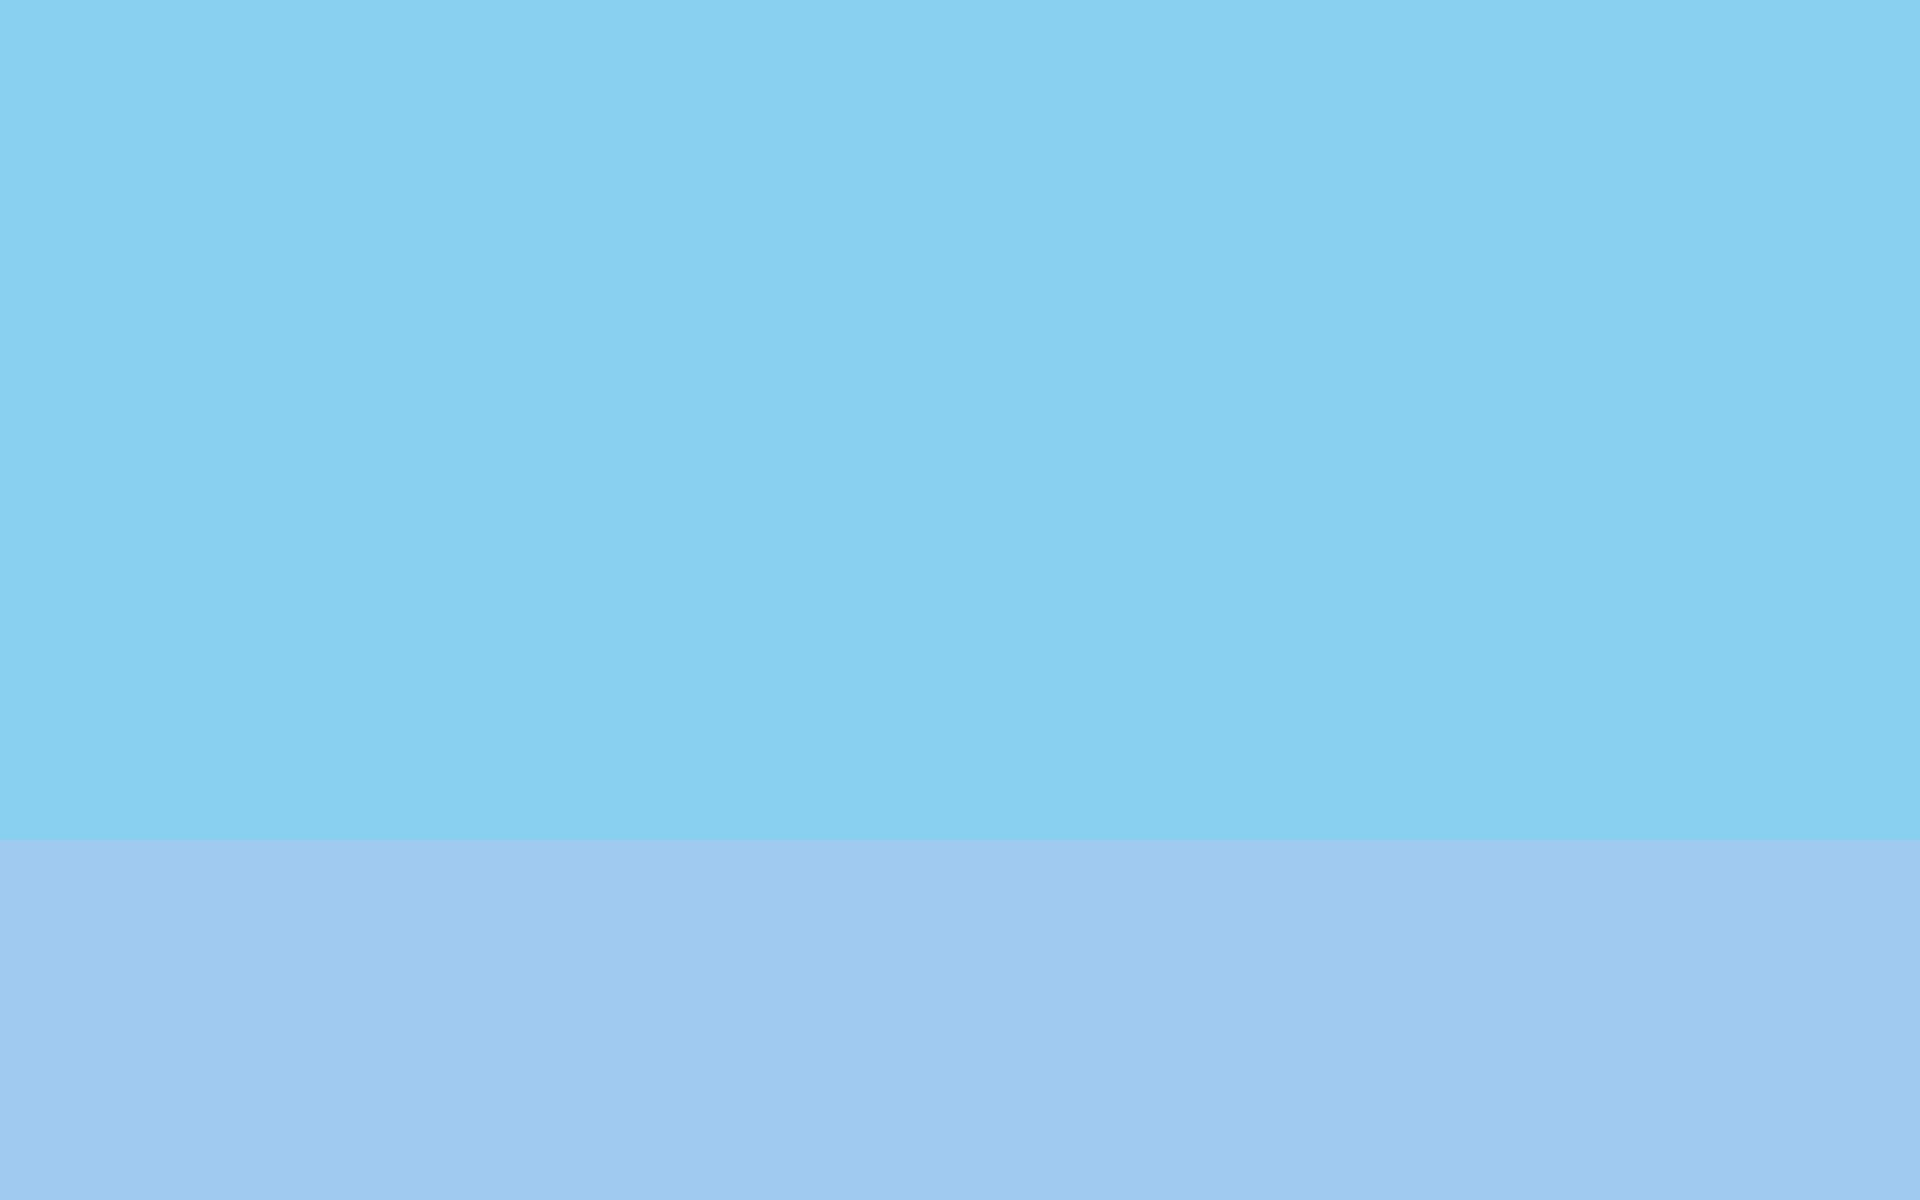 Baby Blue   Wallpaper High Definition High Quality Widescreen 1920x1200